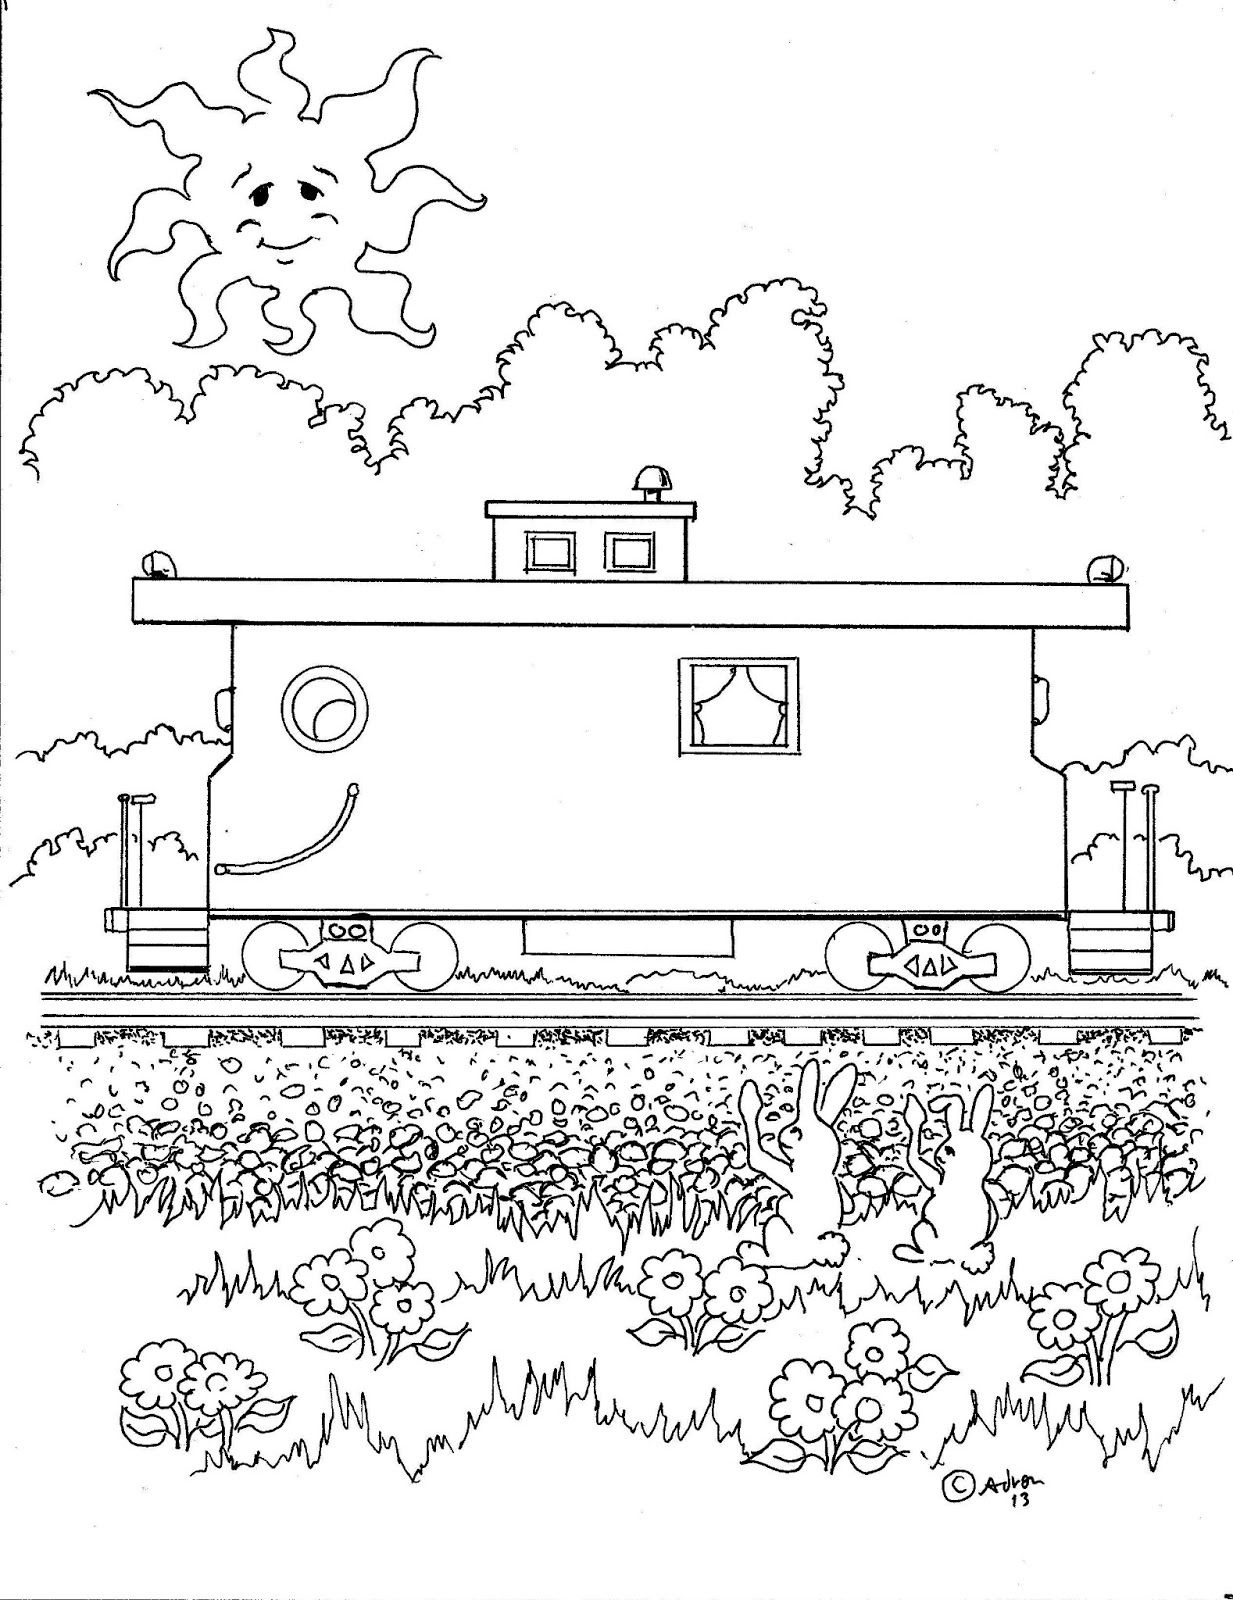 Pin von Adron Dozat auf Coloring Pages for Kid | Pinterest